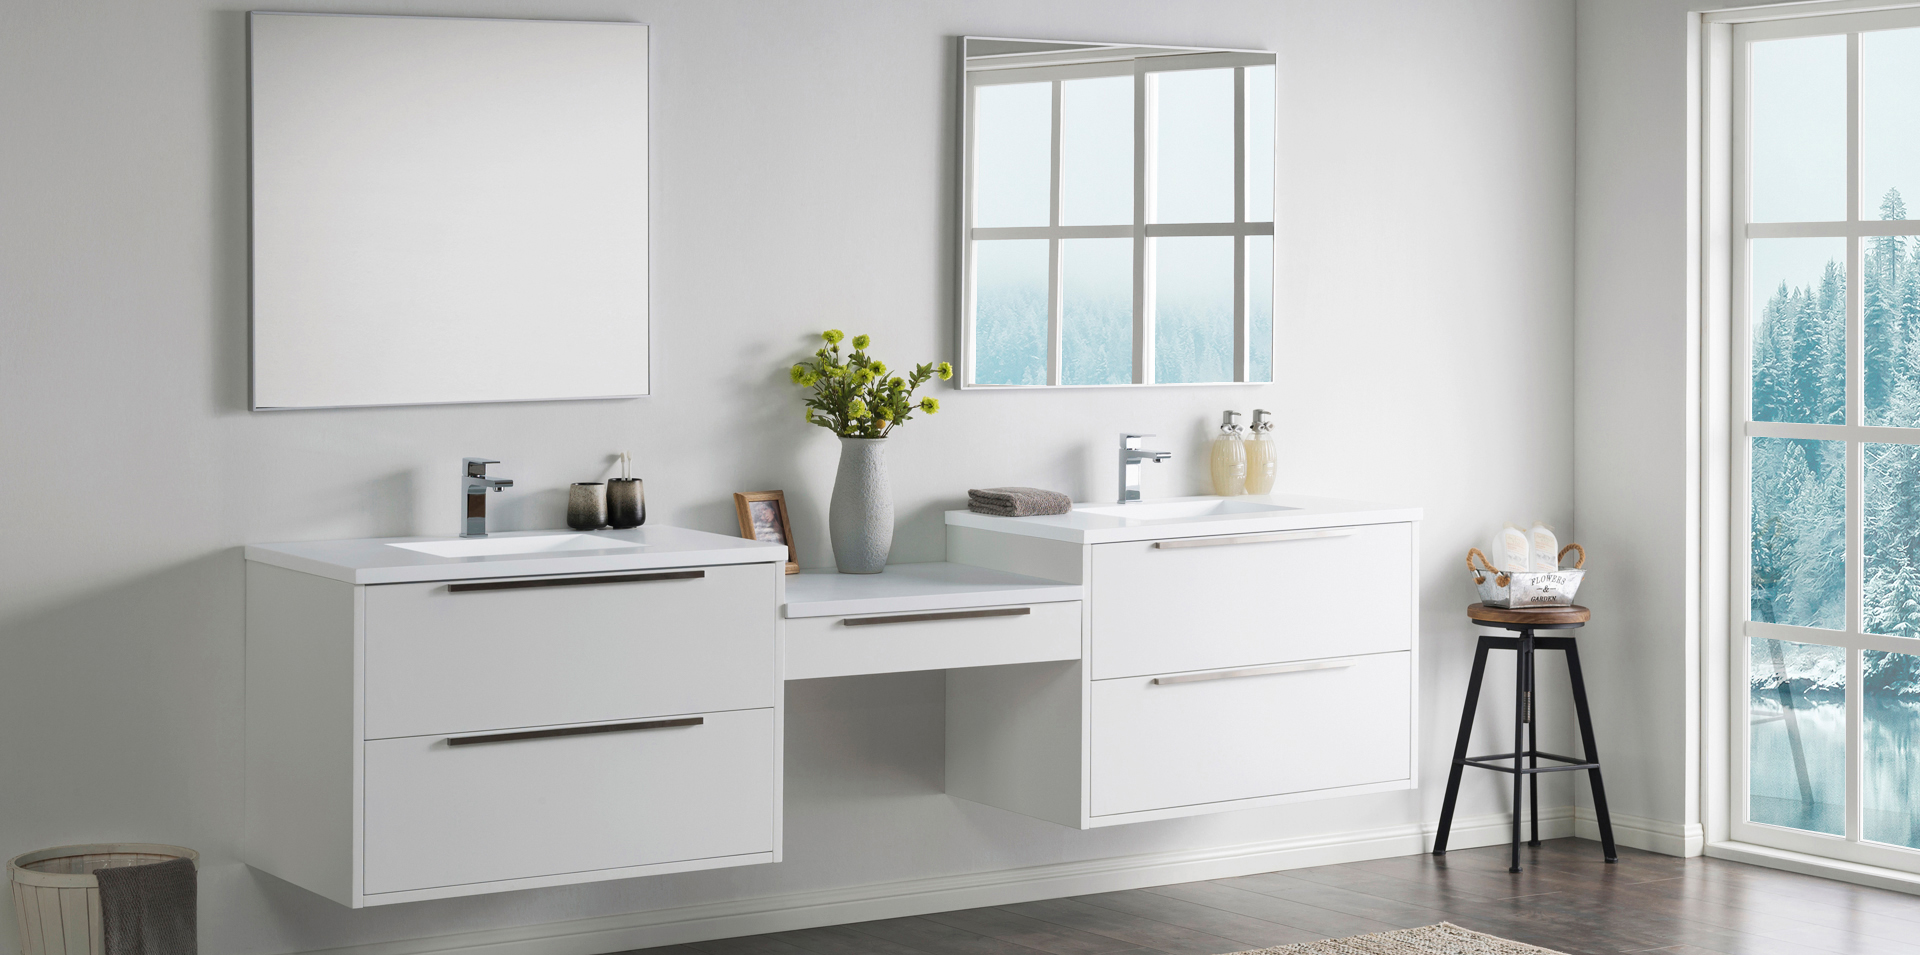 Modern Bathroom Vanities, Cabinets & Faucets